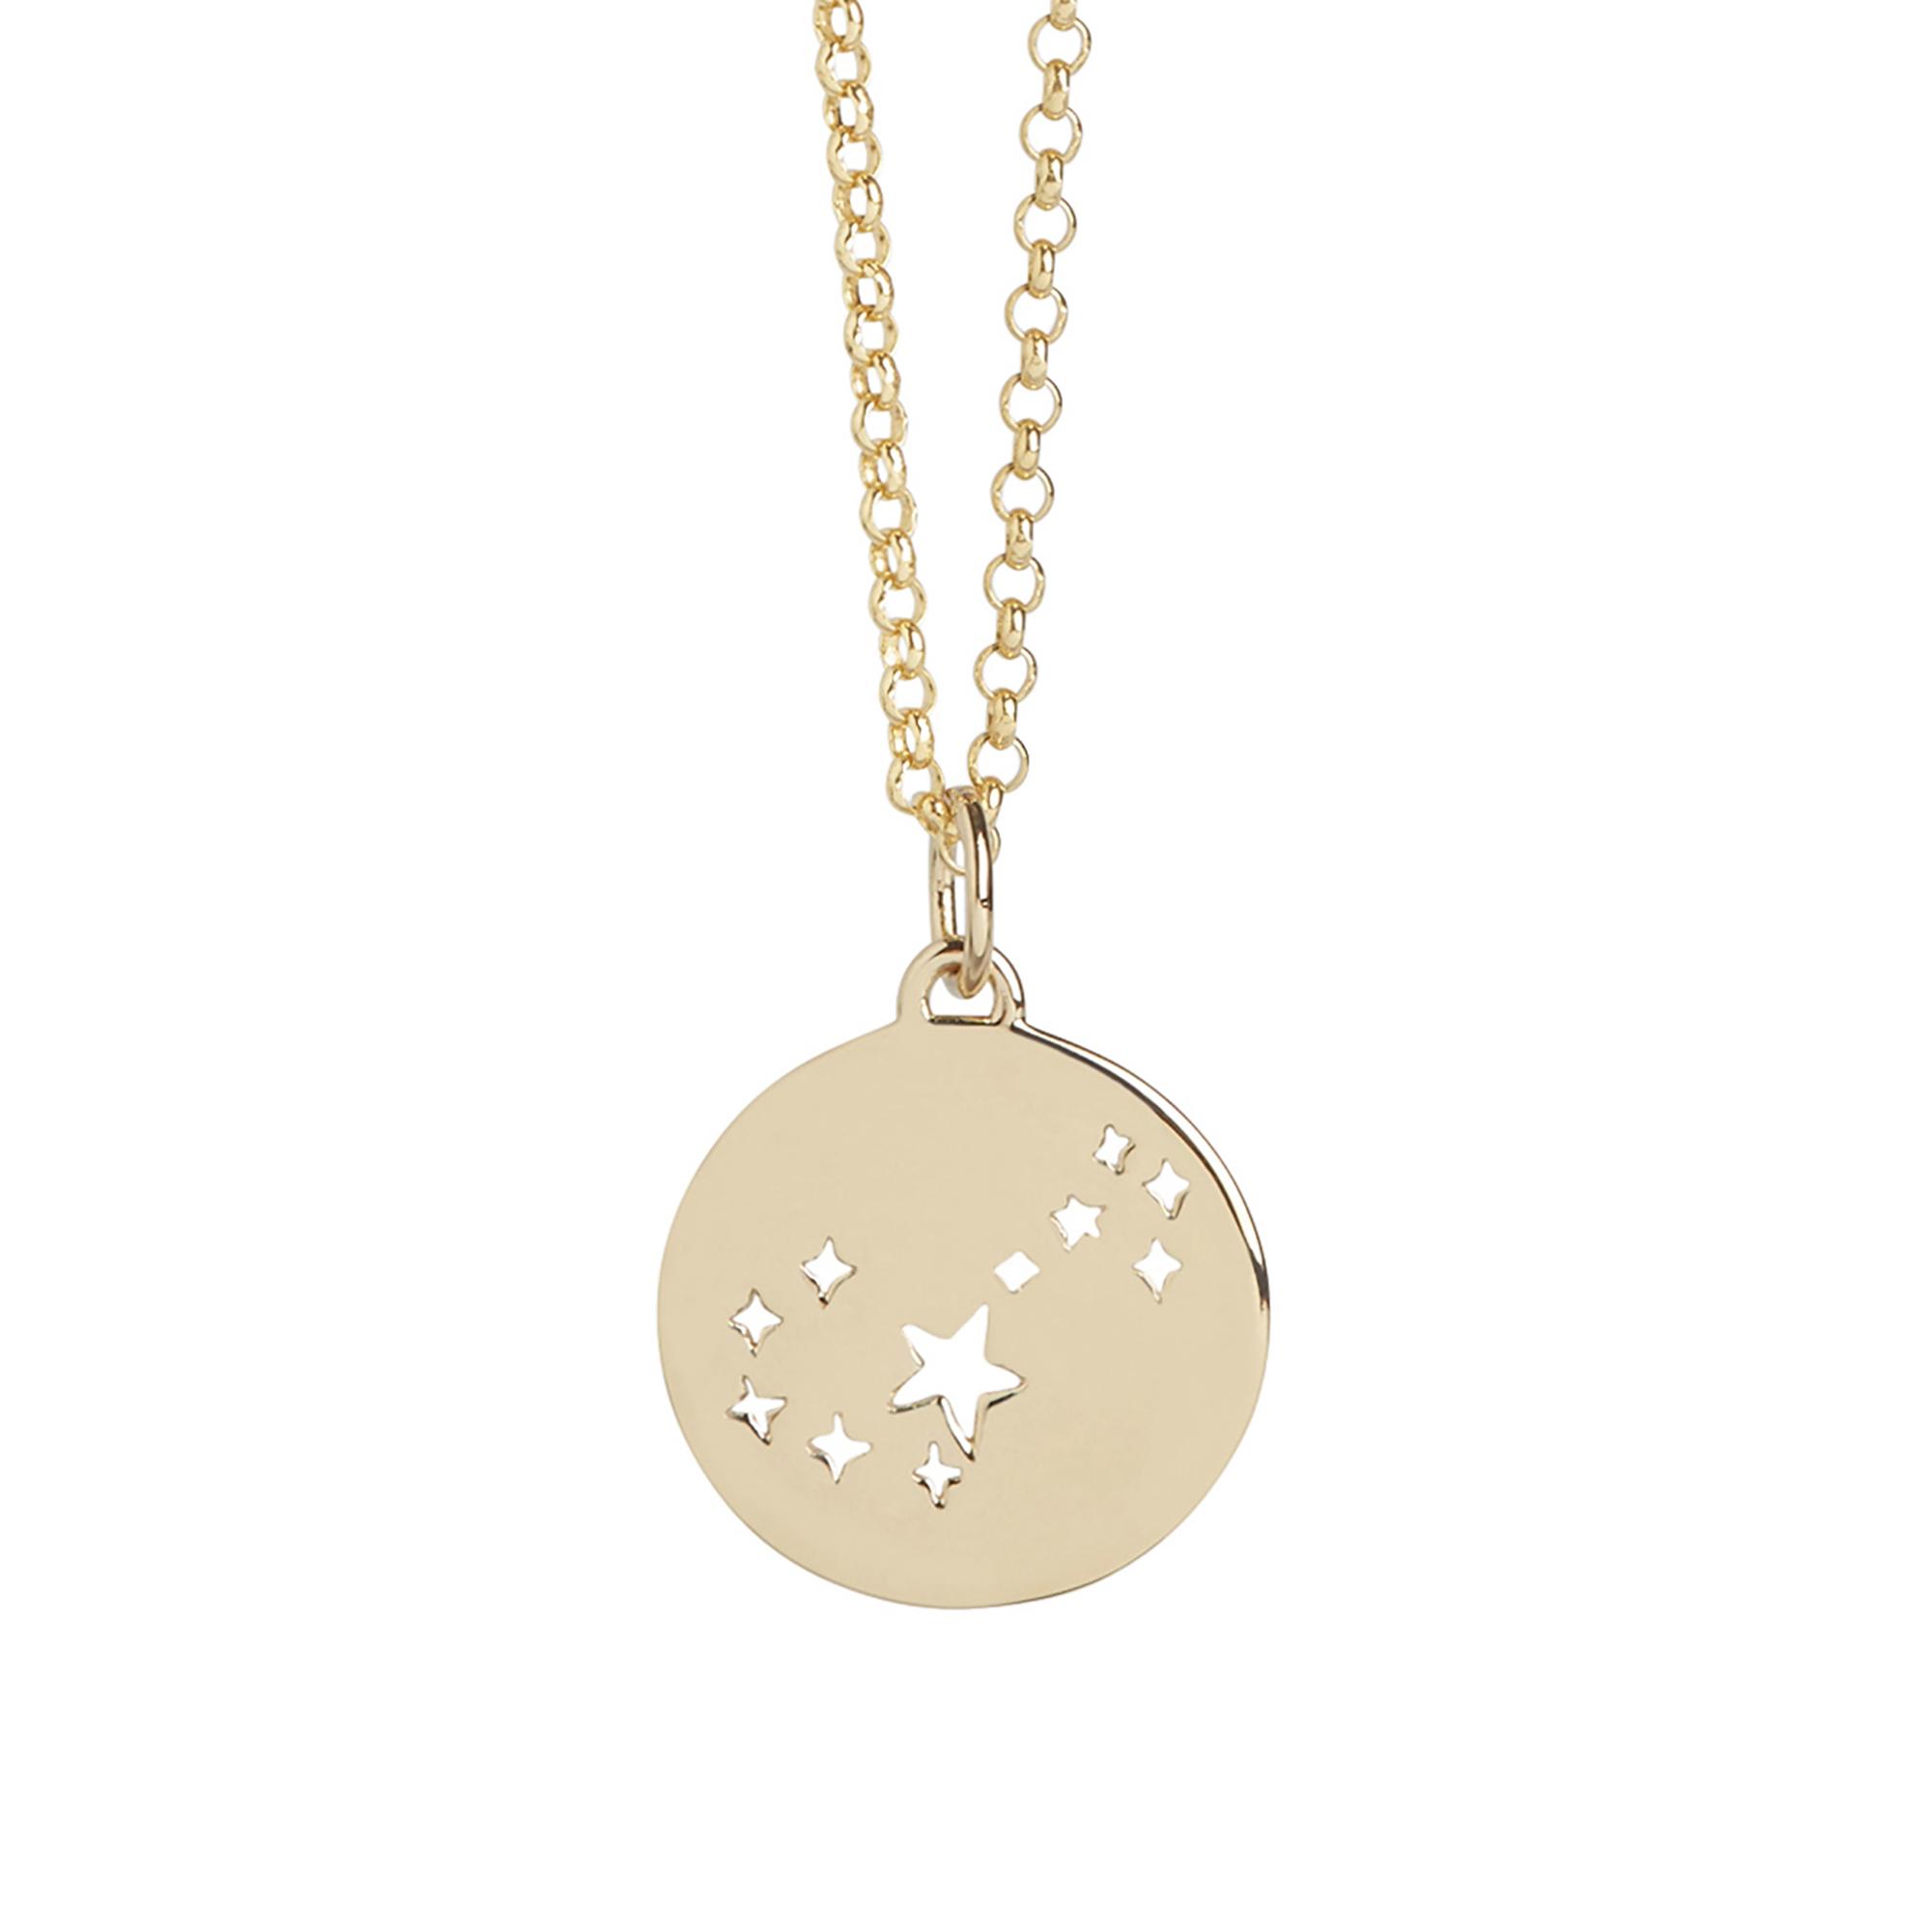 Muru Scorpio Star Sign Necklace Gold Plated